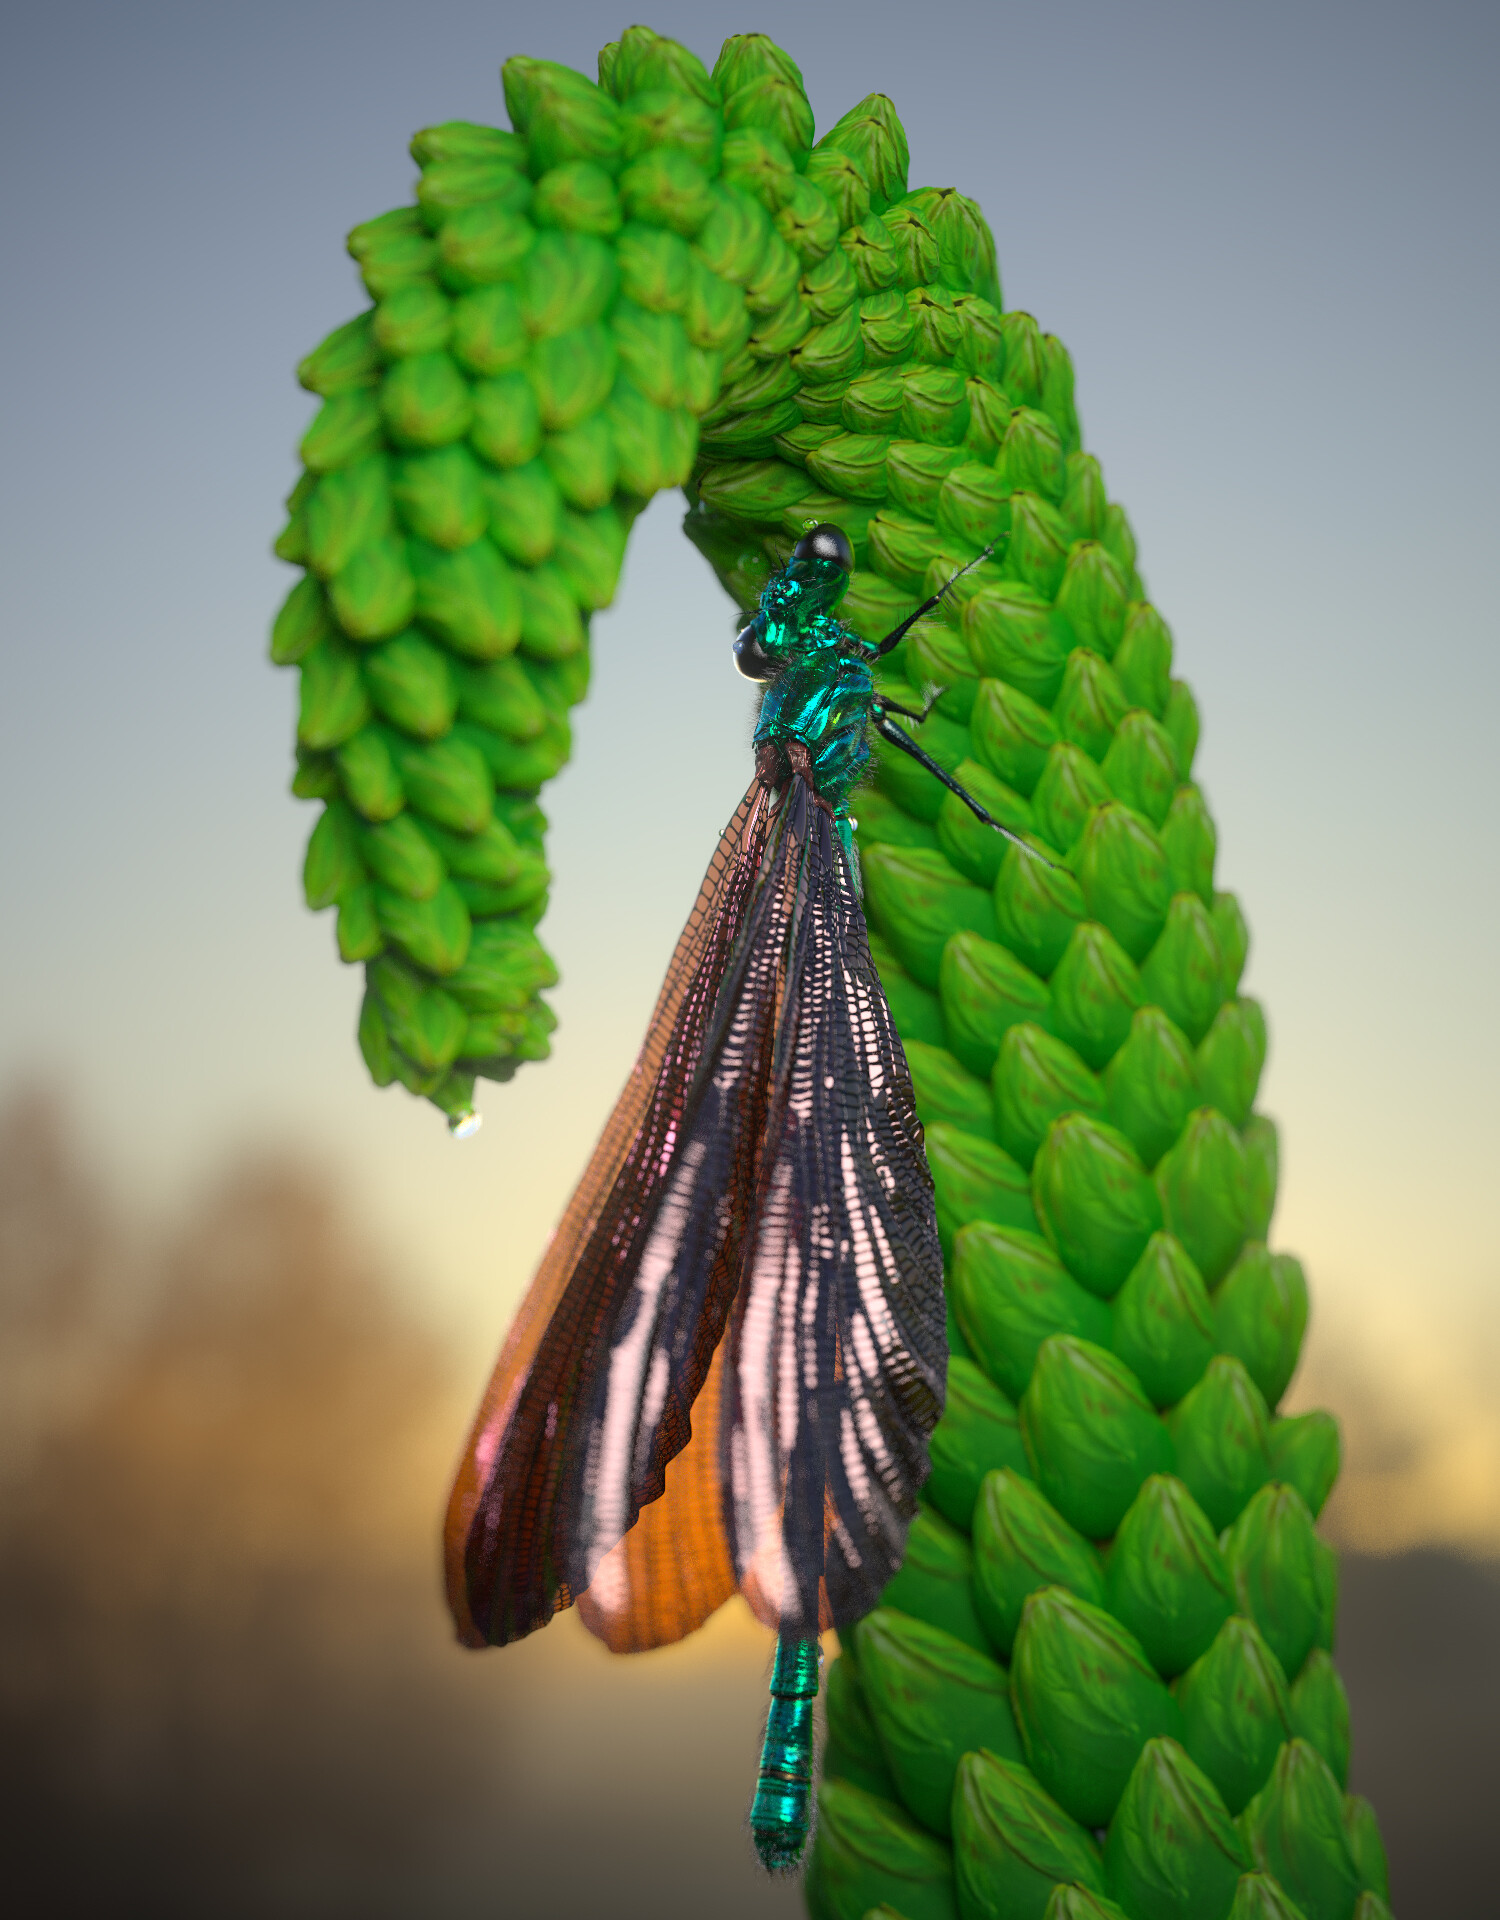 eric-keller-cmaculata-beauty-07